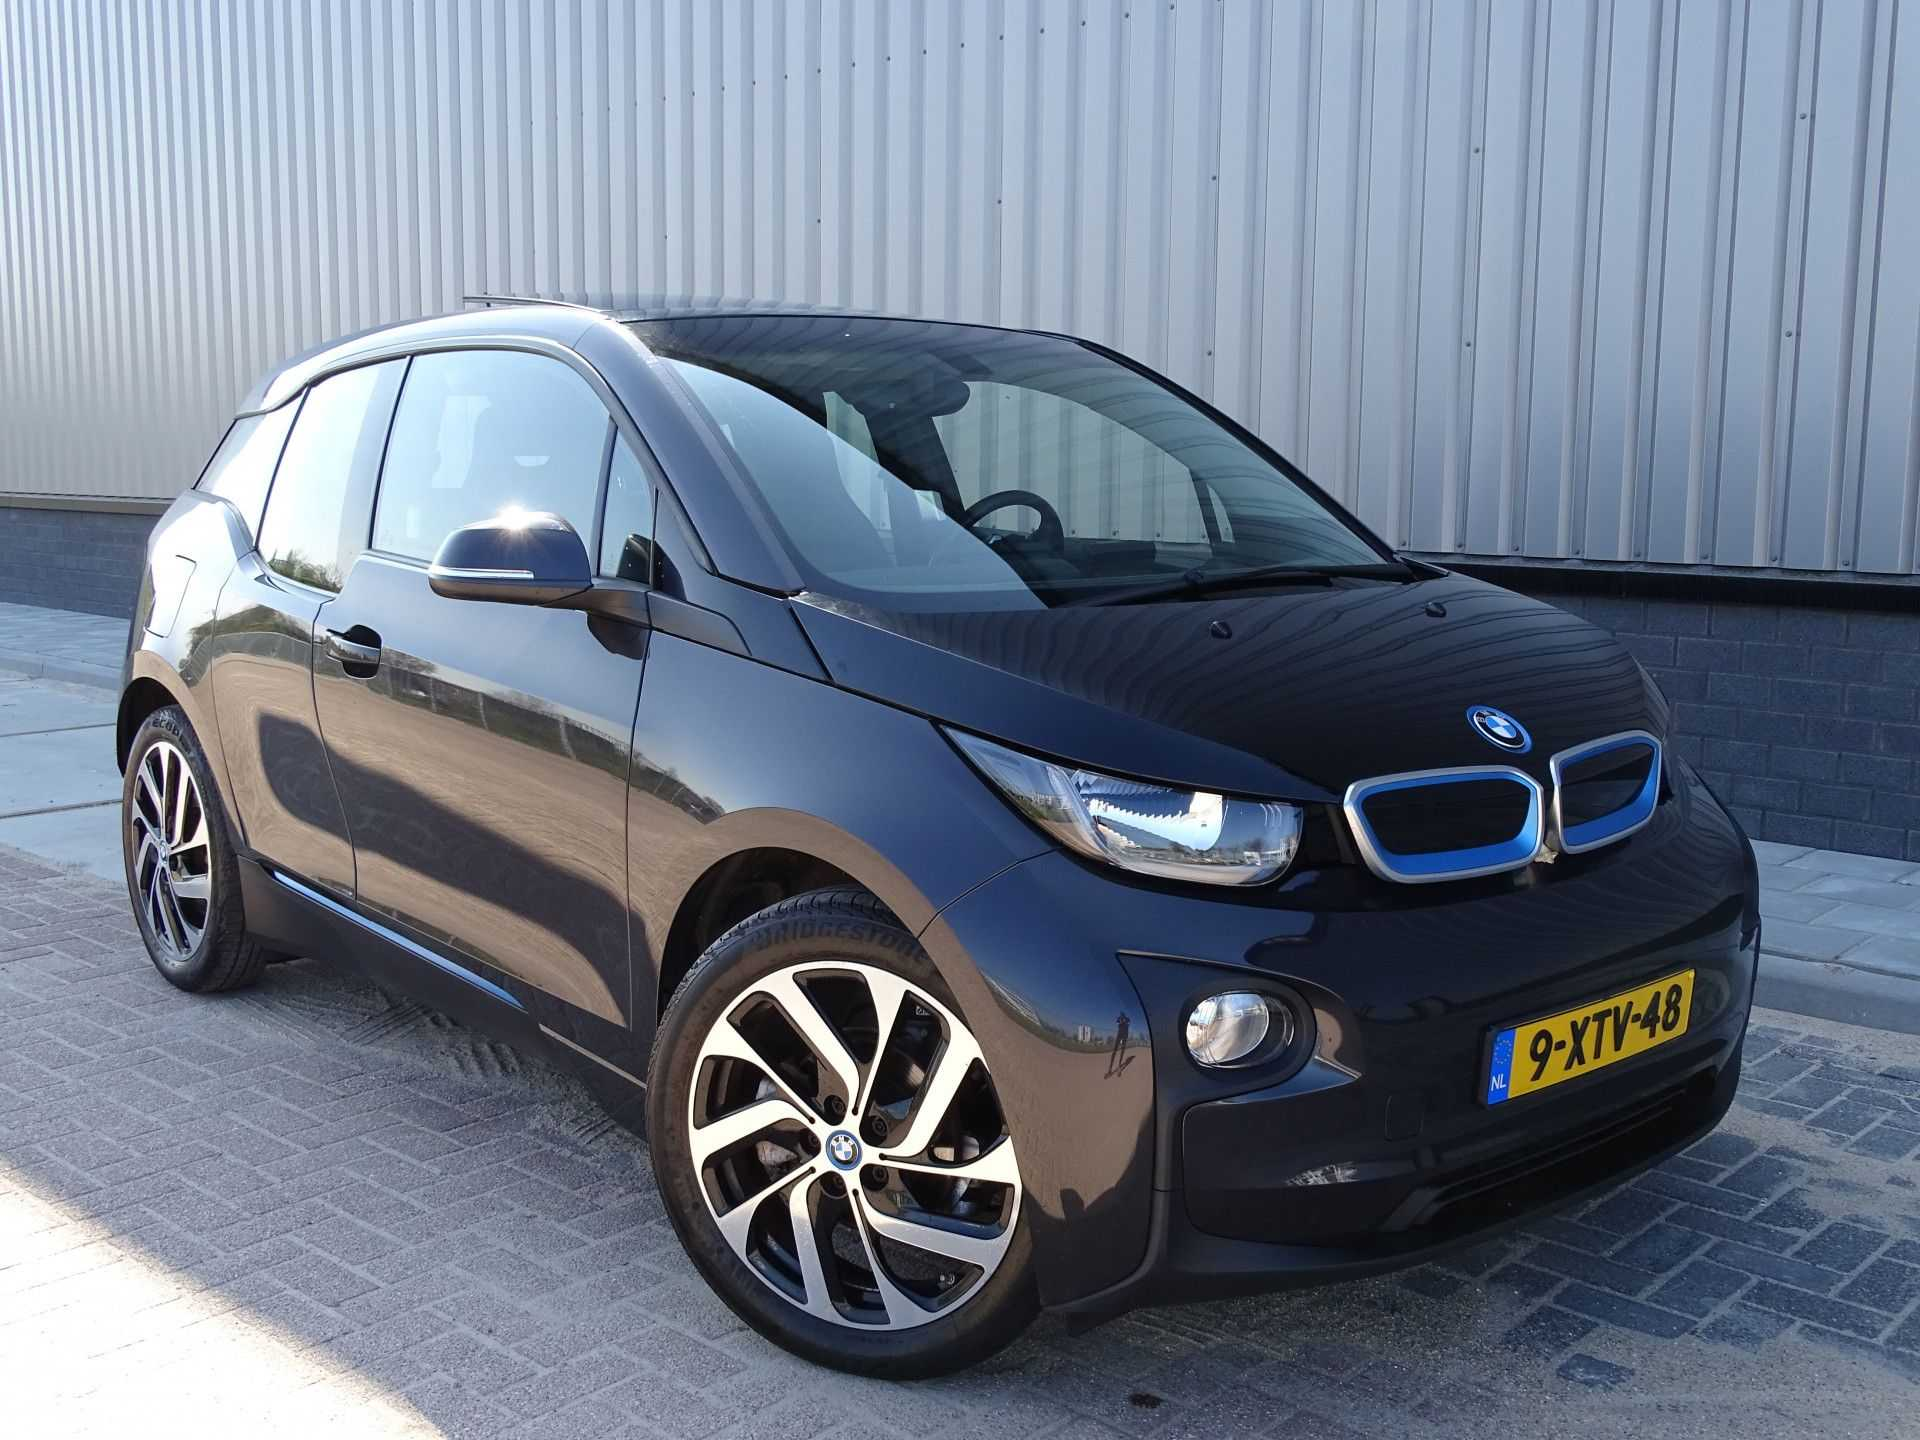 BMW i3 Basis Comfort Advance 22 kWh Marge Warmtepomp Navigatie Clima Cruise Panorama afbeelding 1